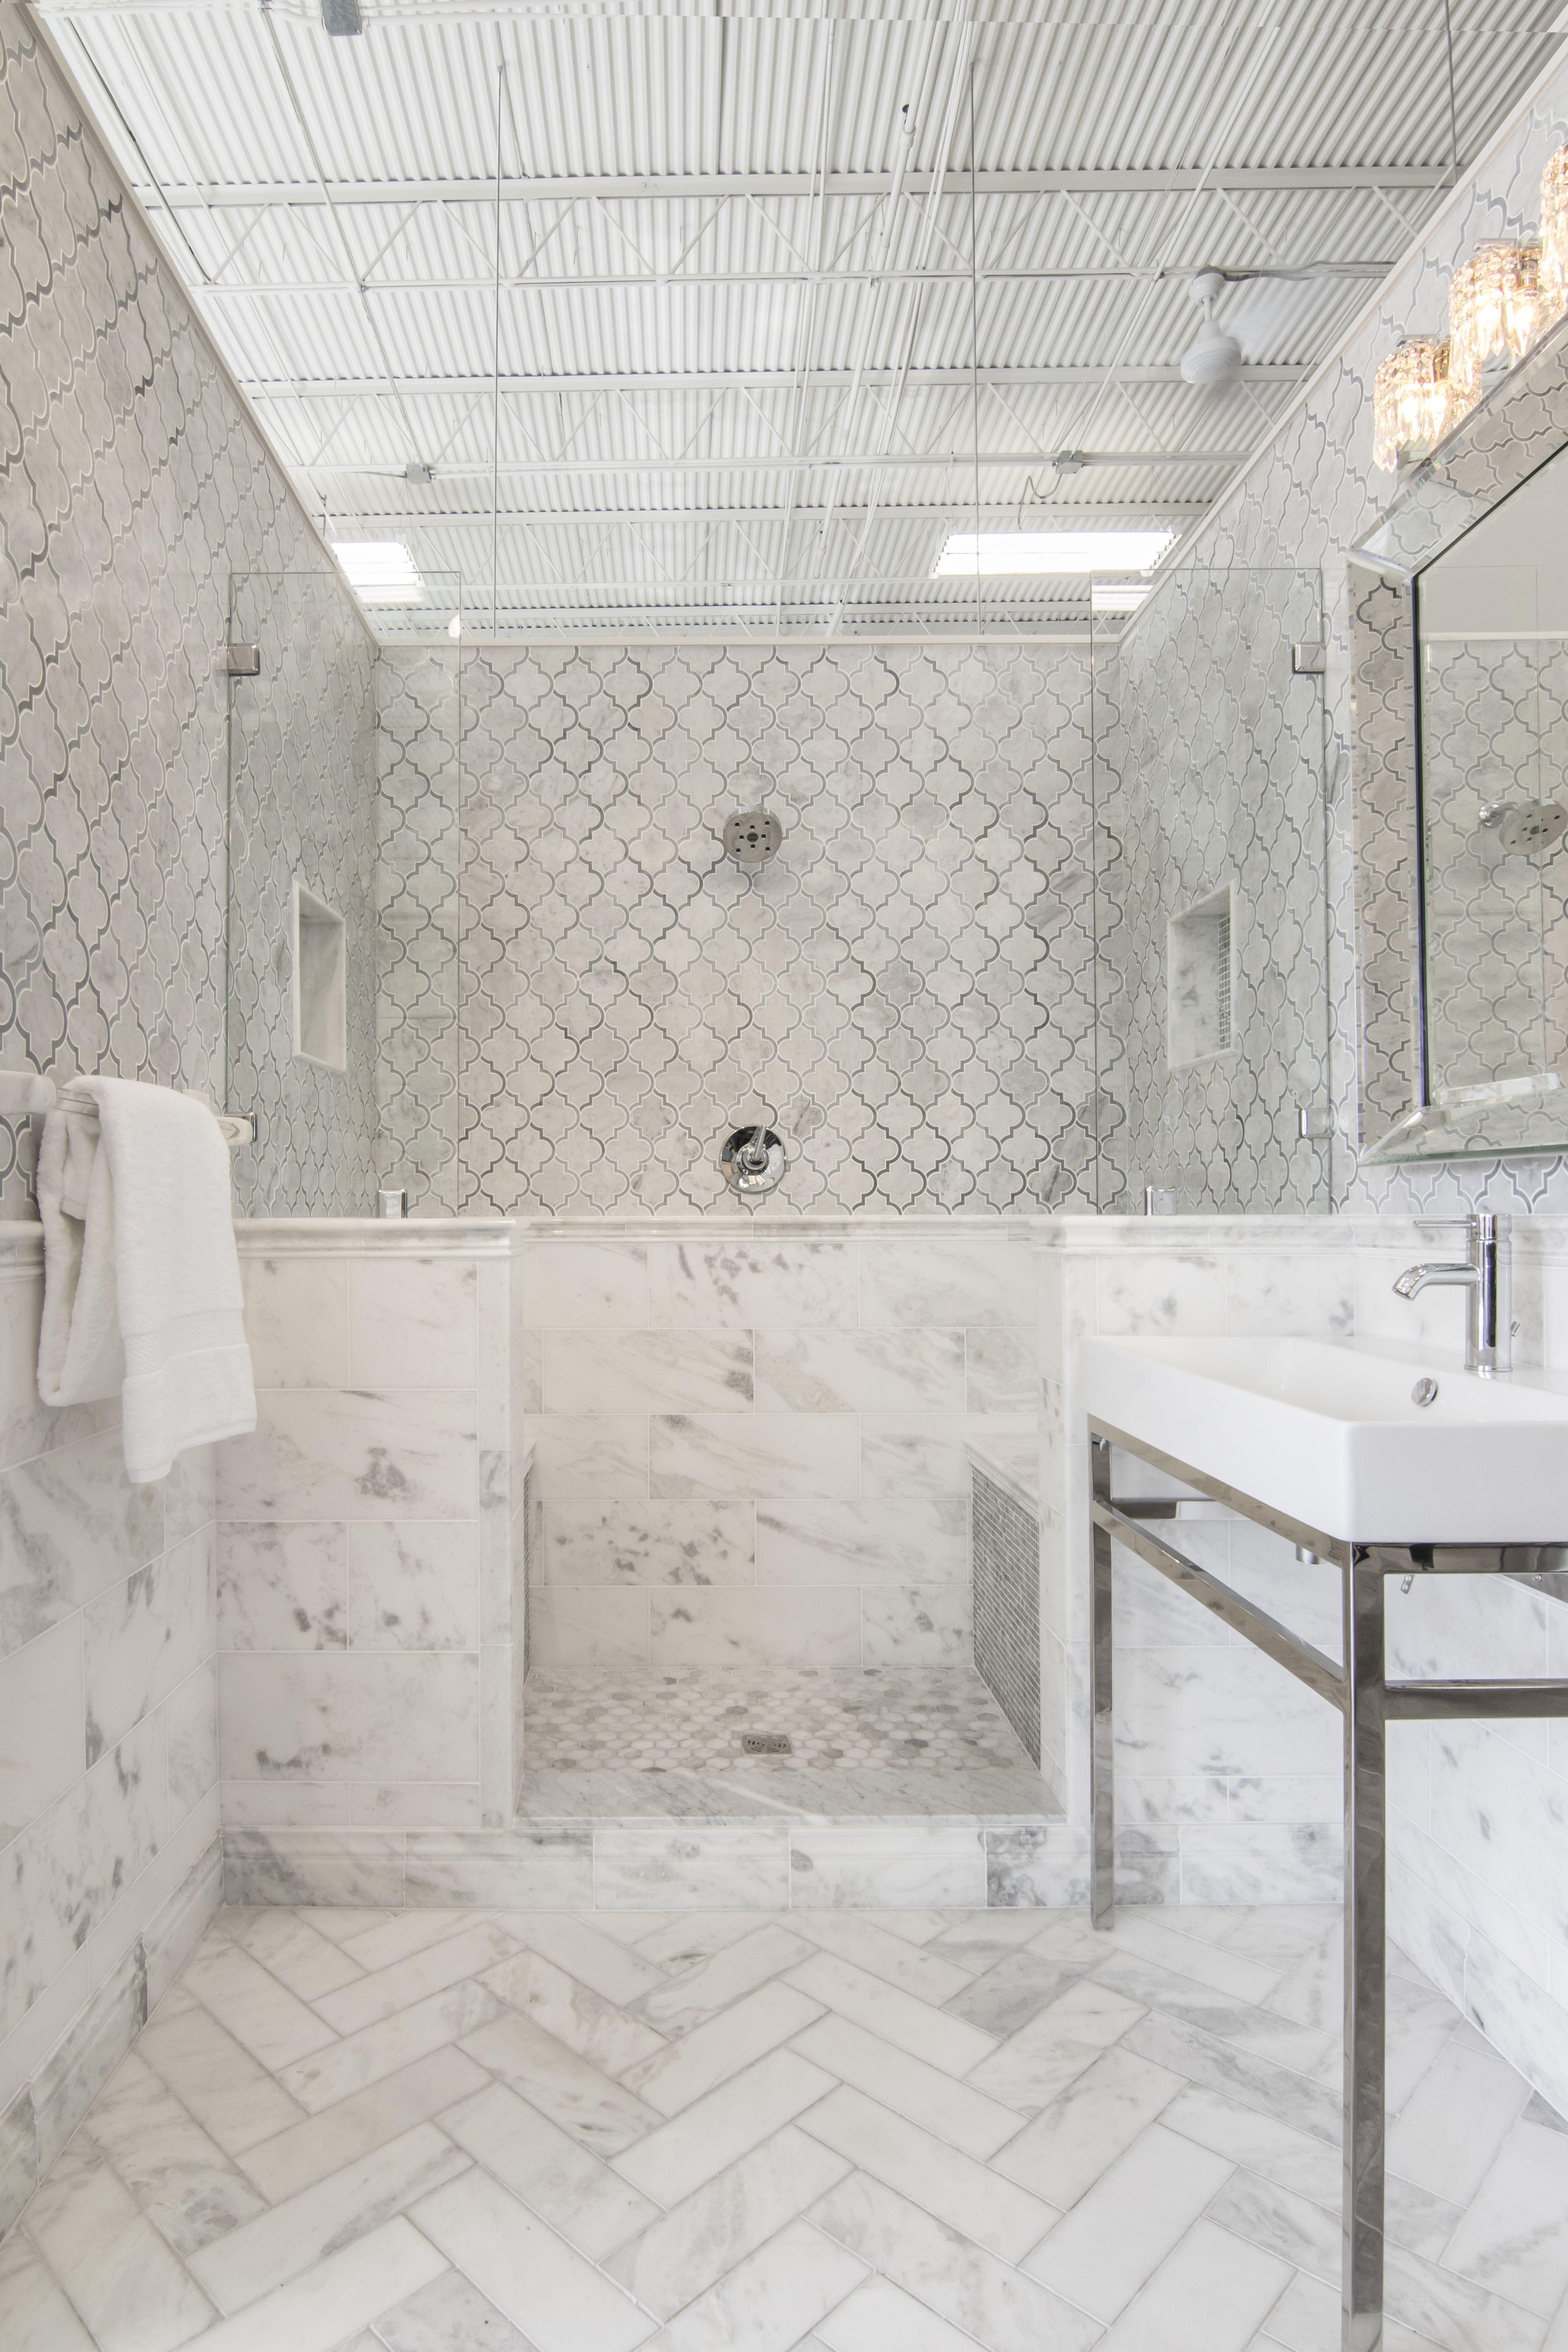 Bathroom Floor Tile Tempesta Neve Polished Marble Subway Tile Kitchenflooring Pennyflooring Marble Bathroom Designs Marble Bathroom Floor Bathrooms Remodel